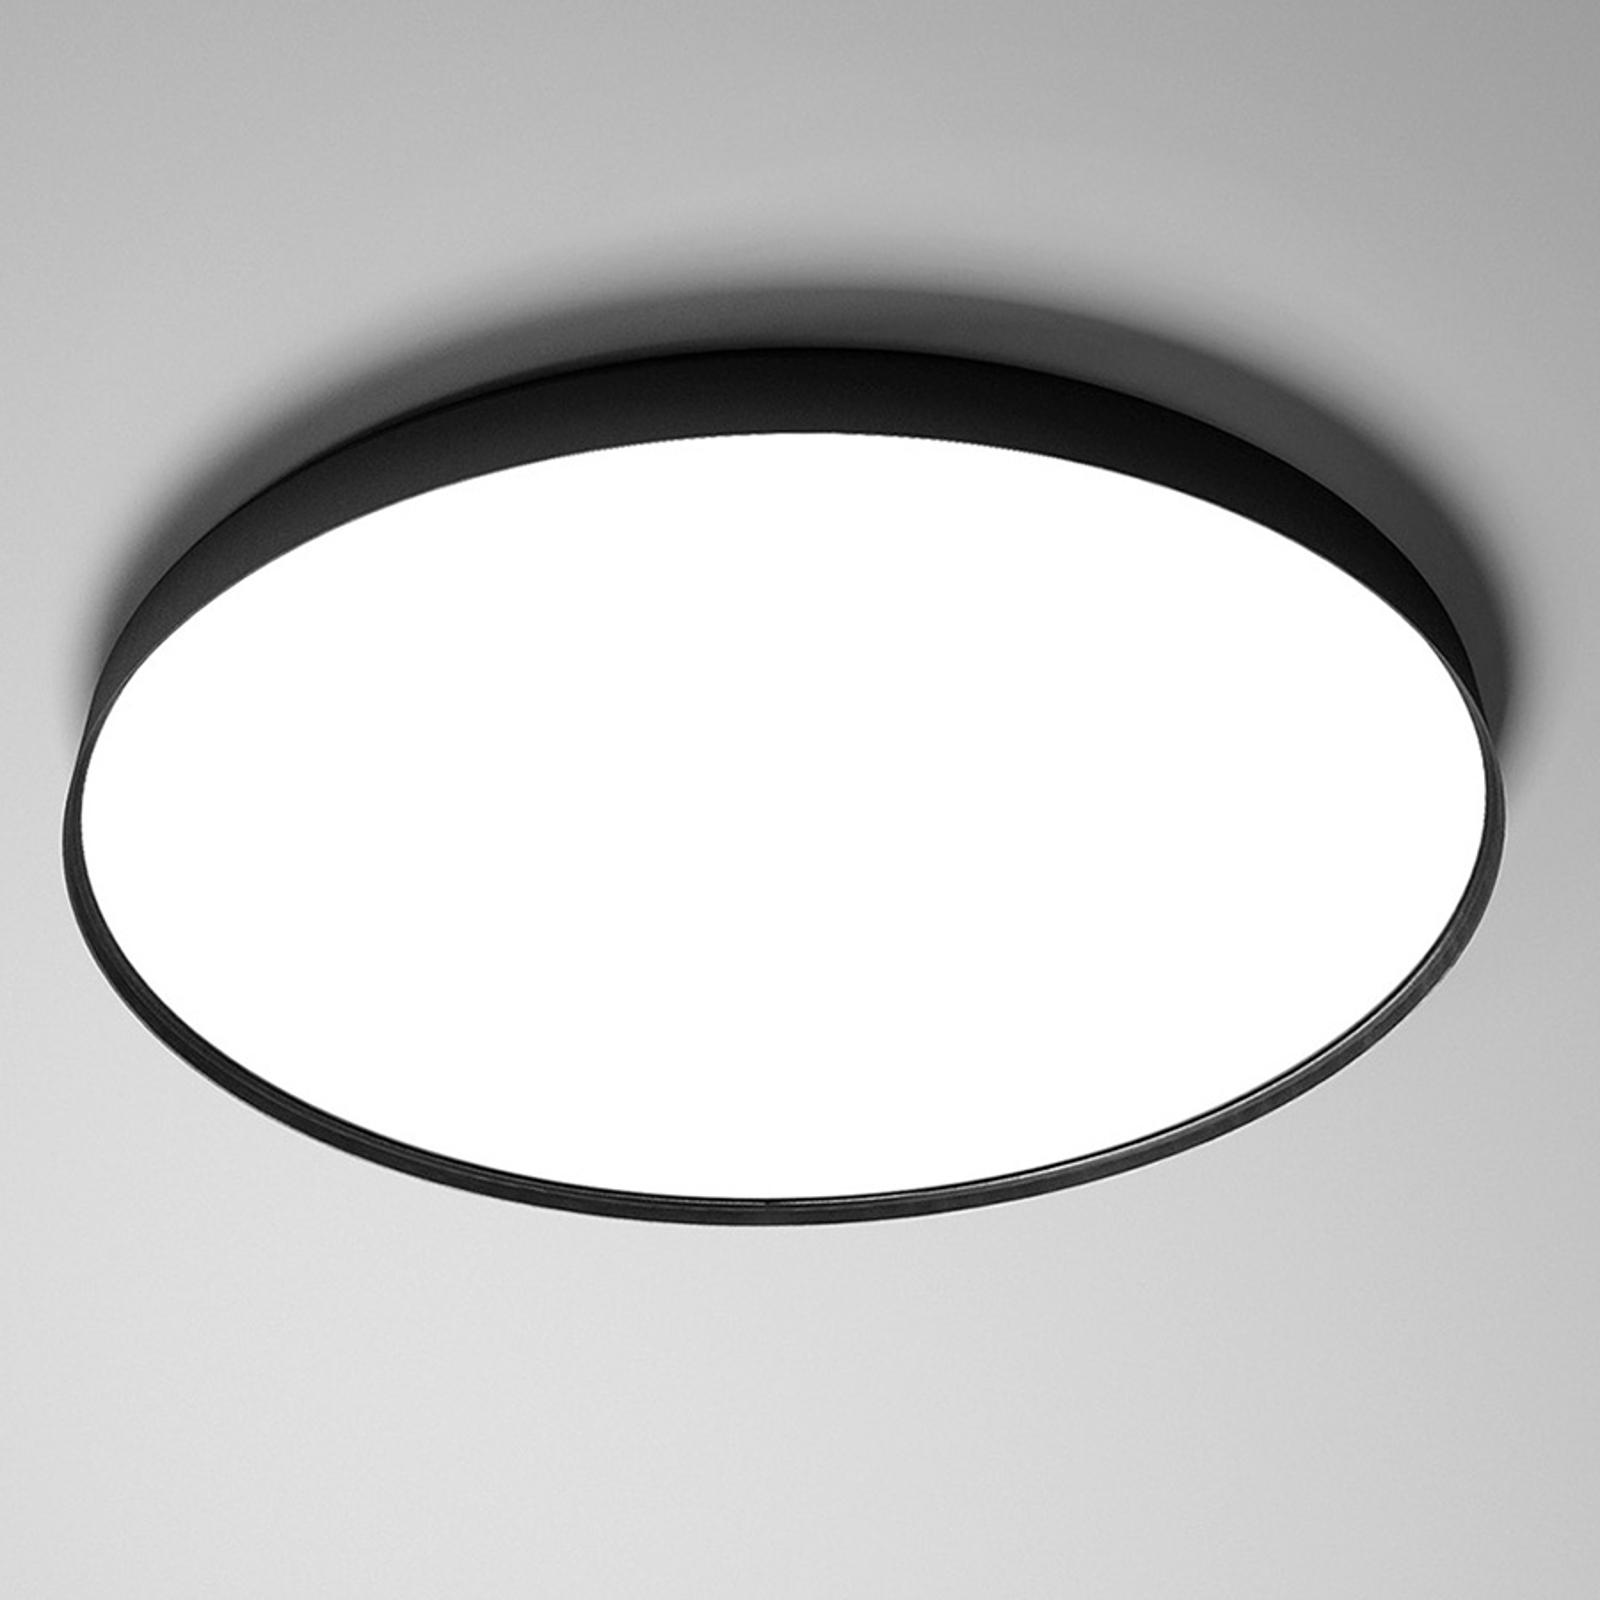 Luceplan Compendium Plate LED plafondlamp, zwart